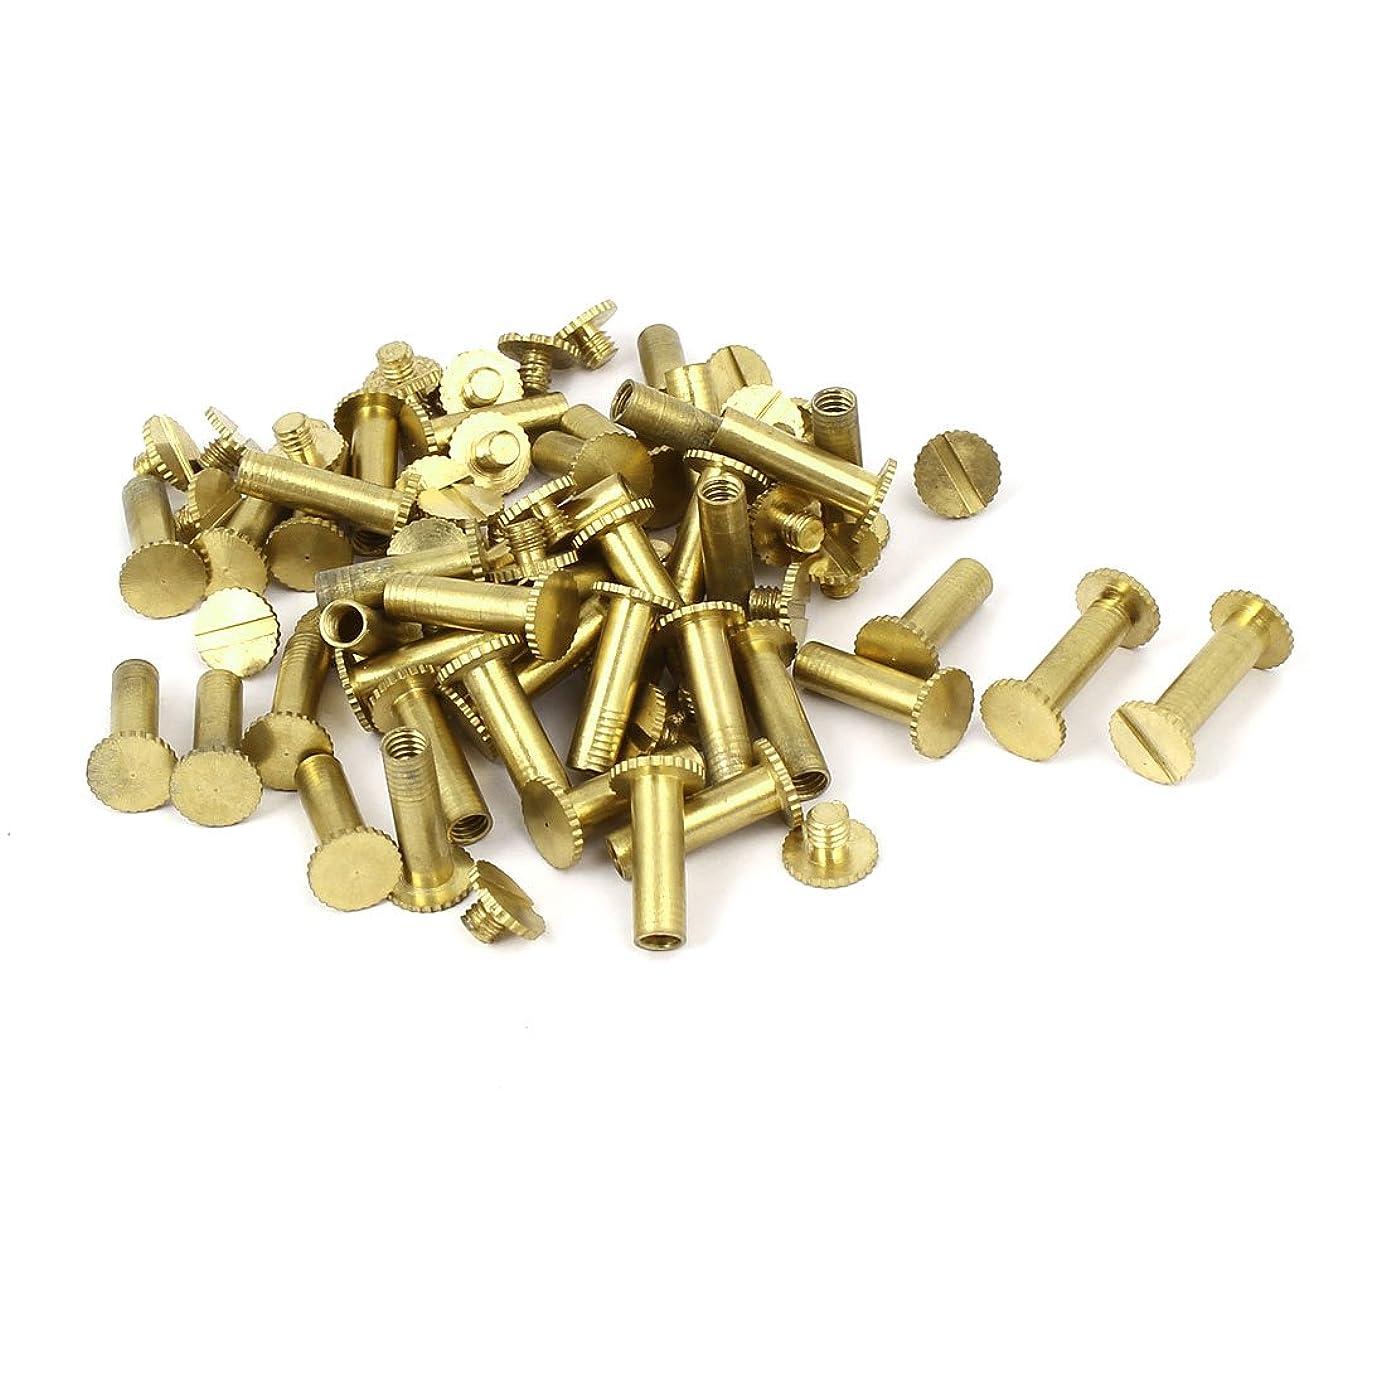 uxcell Photo Albums Scrapbook M5x15mm Brass Slotted Knurling Binding Screw Post 50pcs vuf6988868